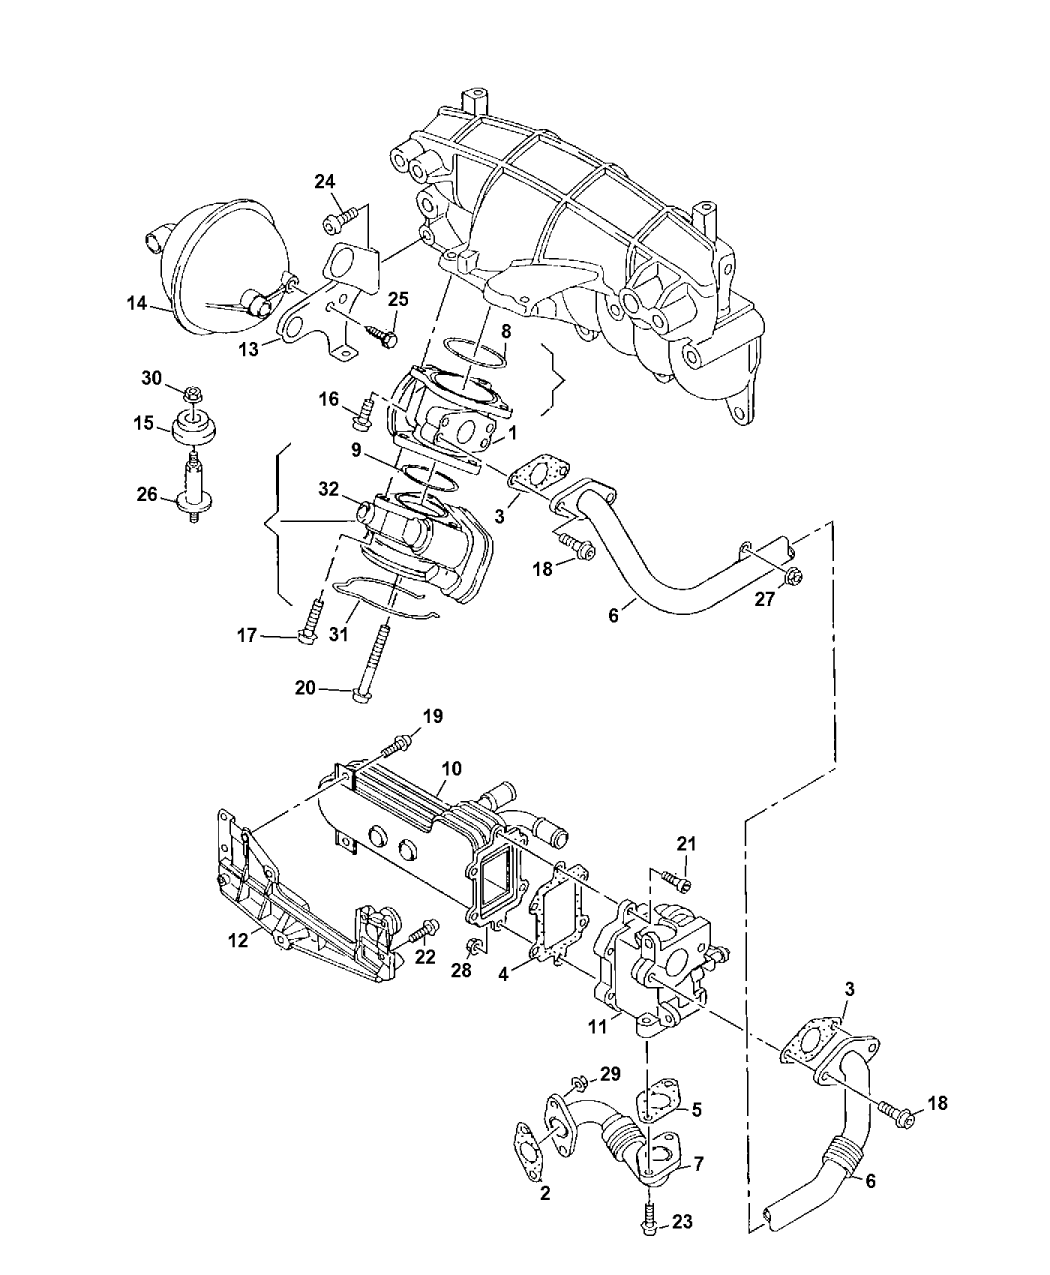 2007 dodge caliber fuel filter location